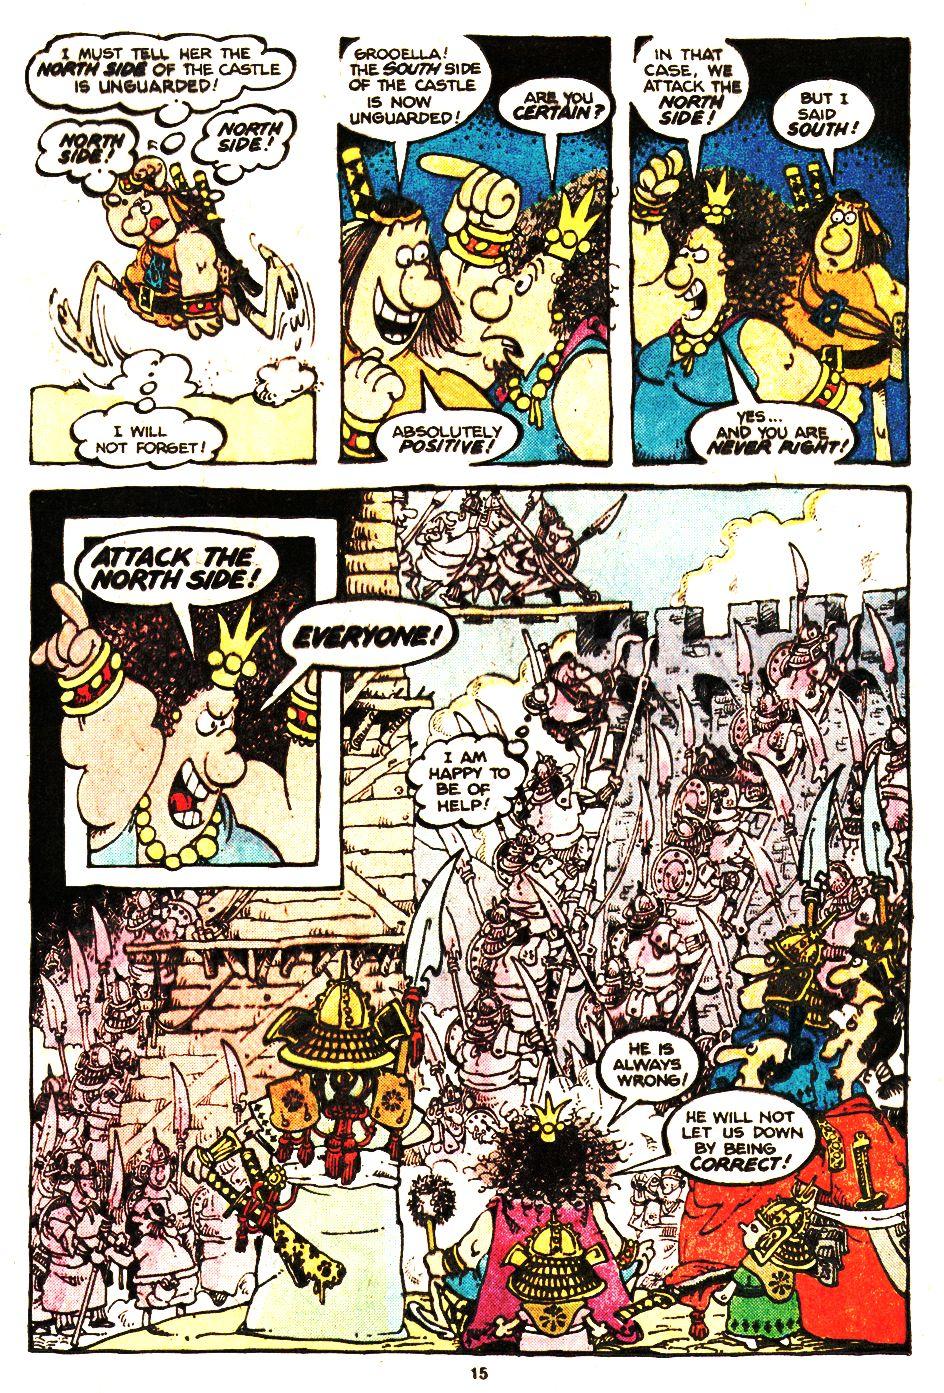 Read online Sergio Aragonés Groo the Wanderer comic -  Issue #20 - 15